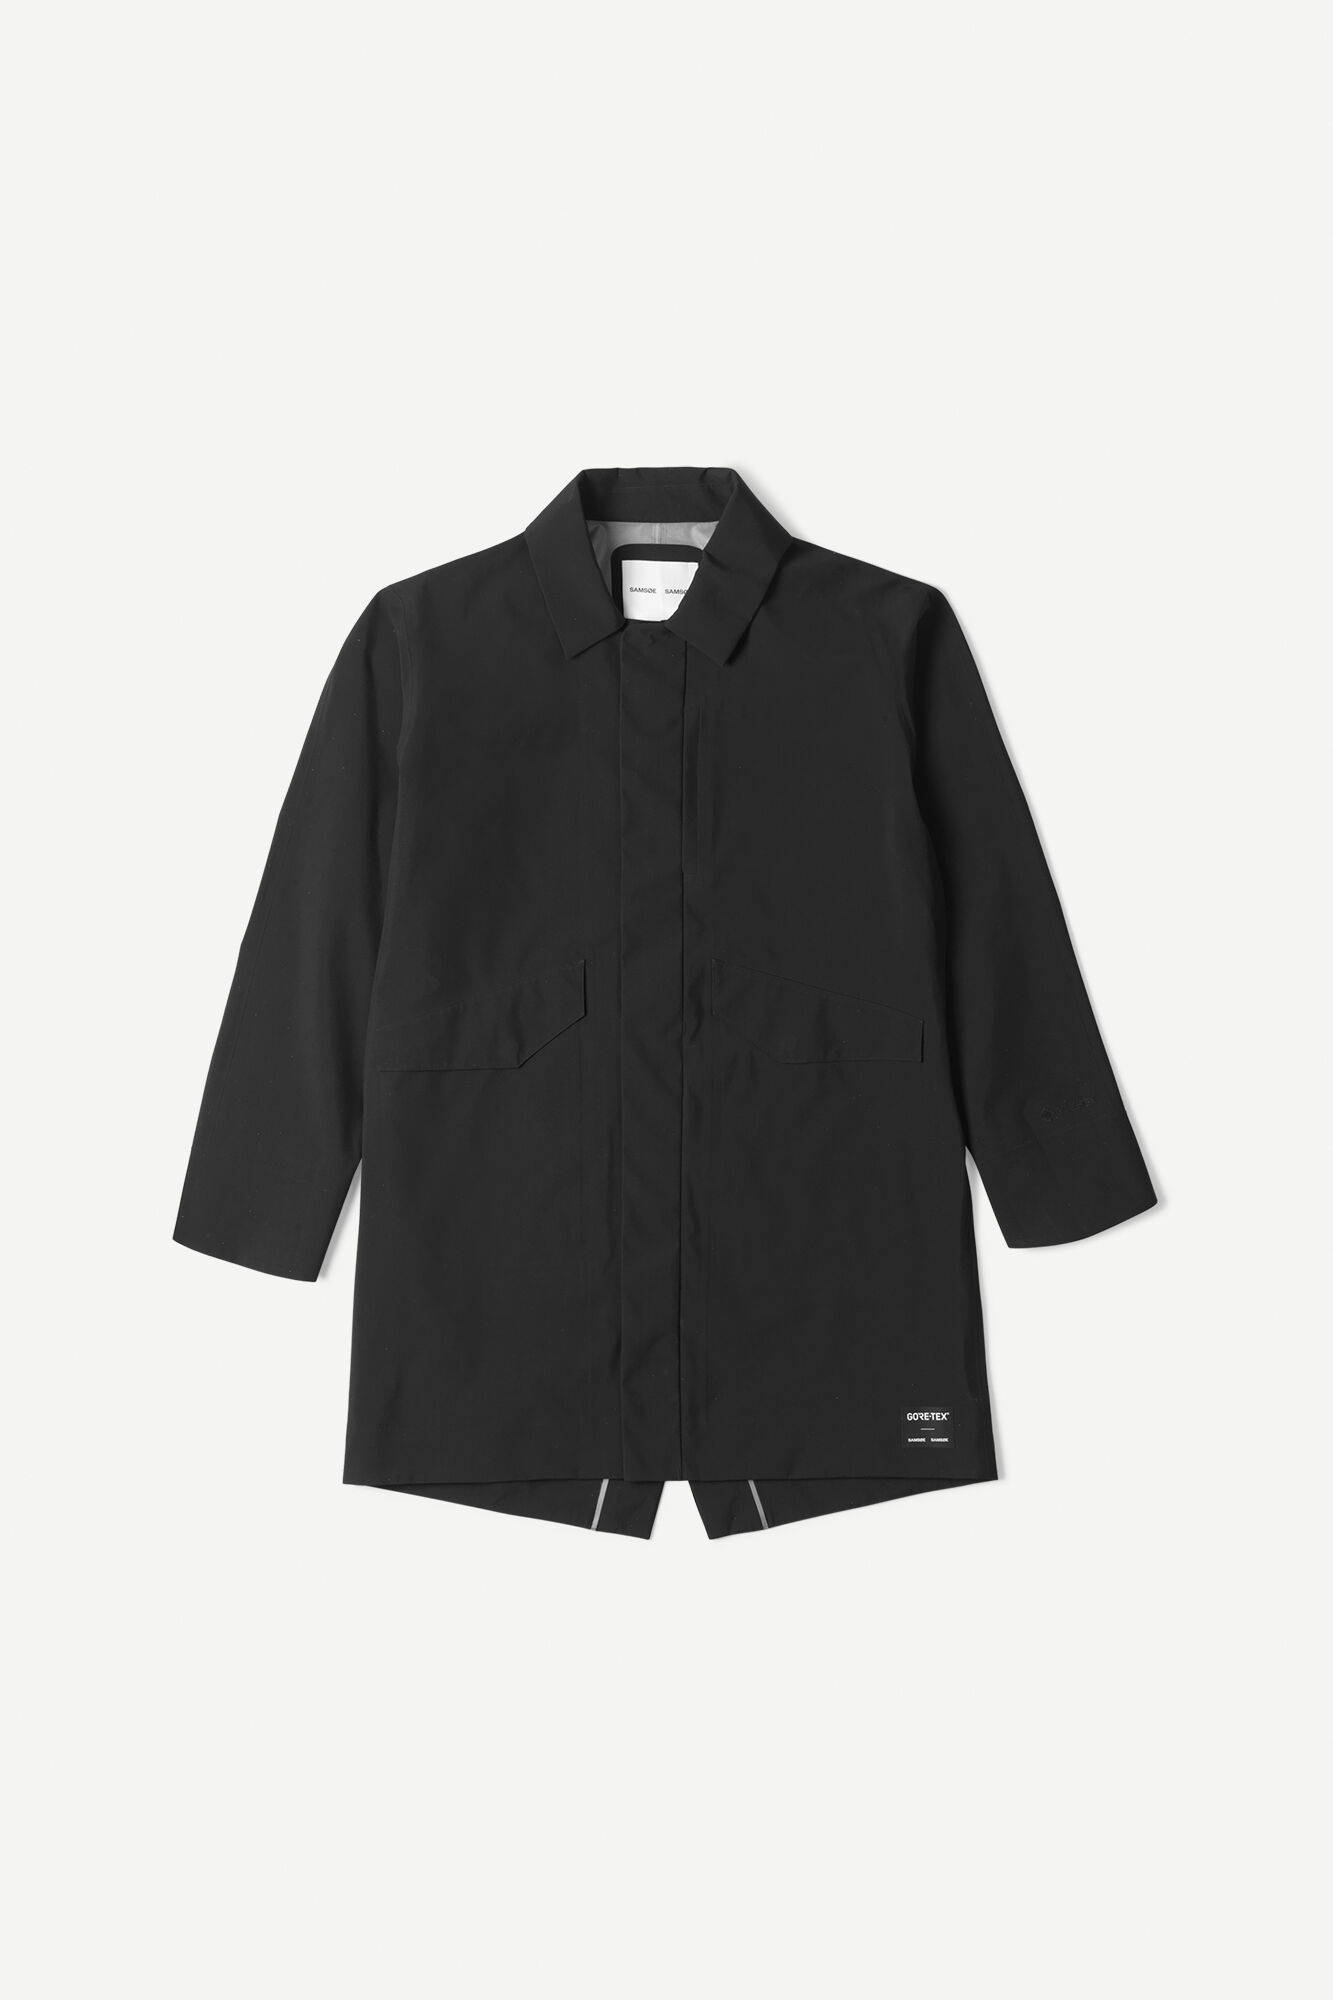 Torro jacket 11682